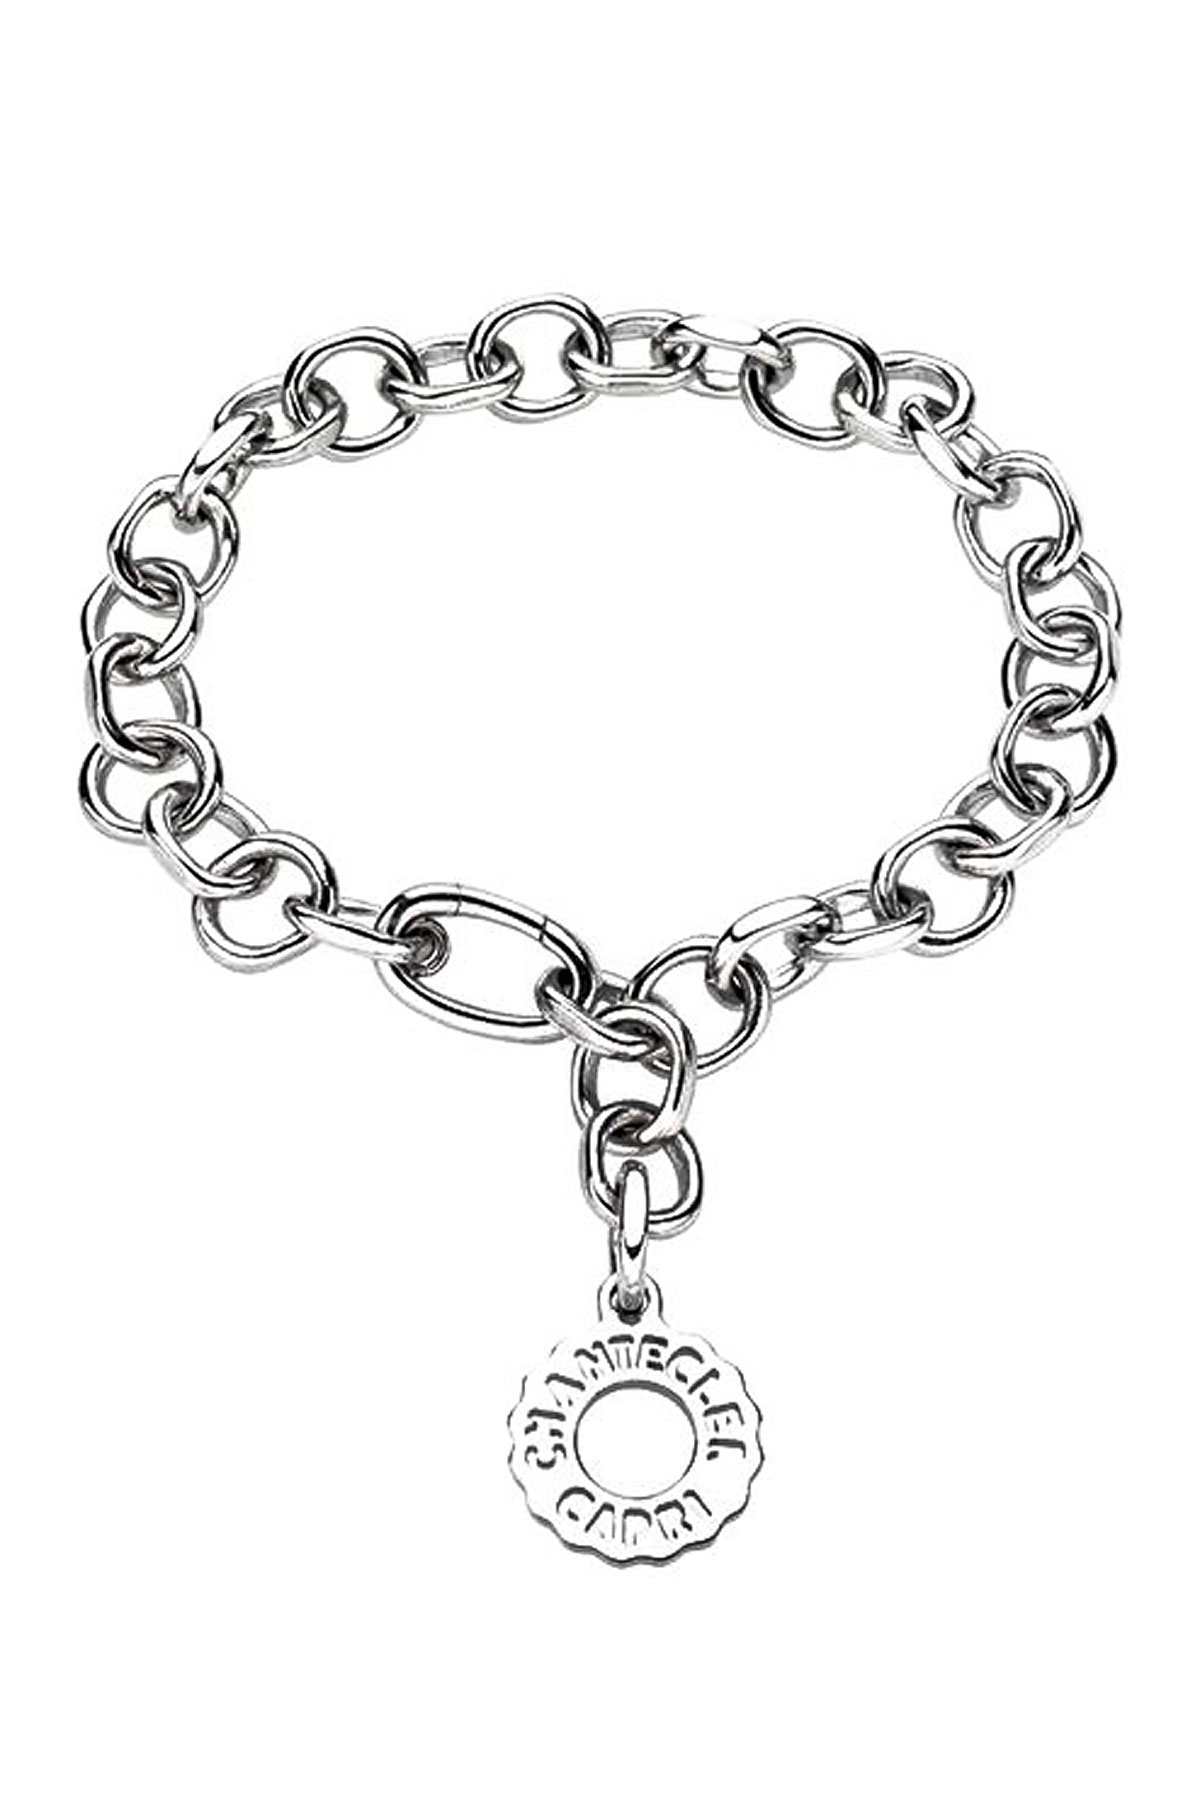 Image of Chantecler Bracelet for Women, Silver, Silver, 2017